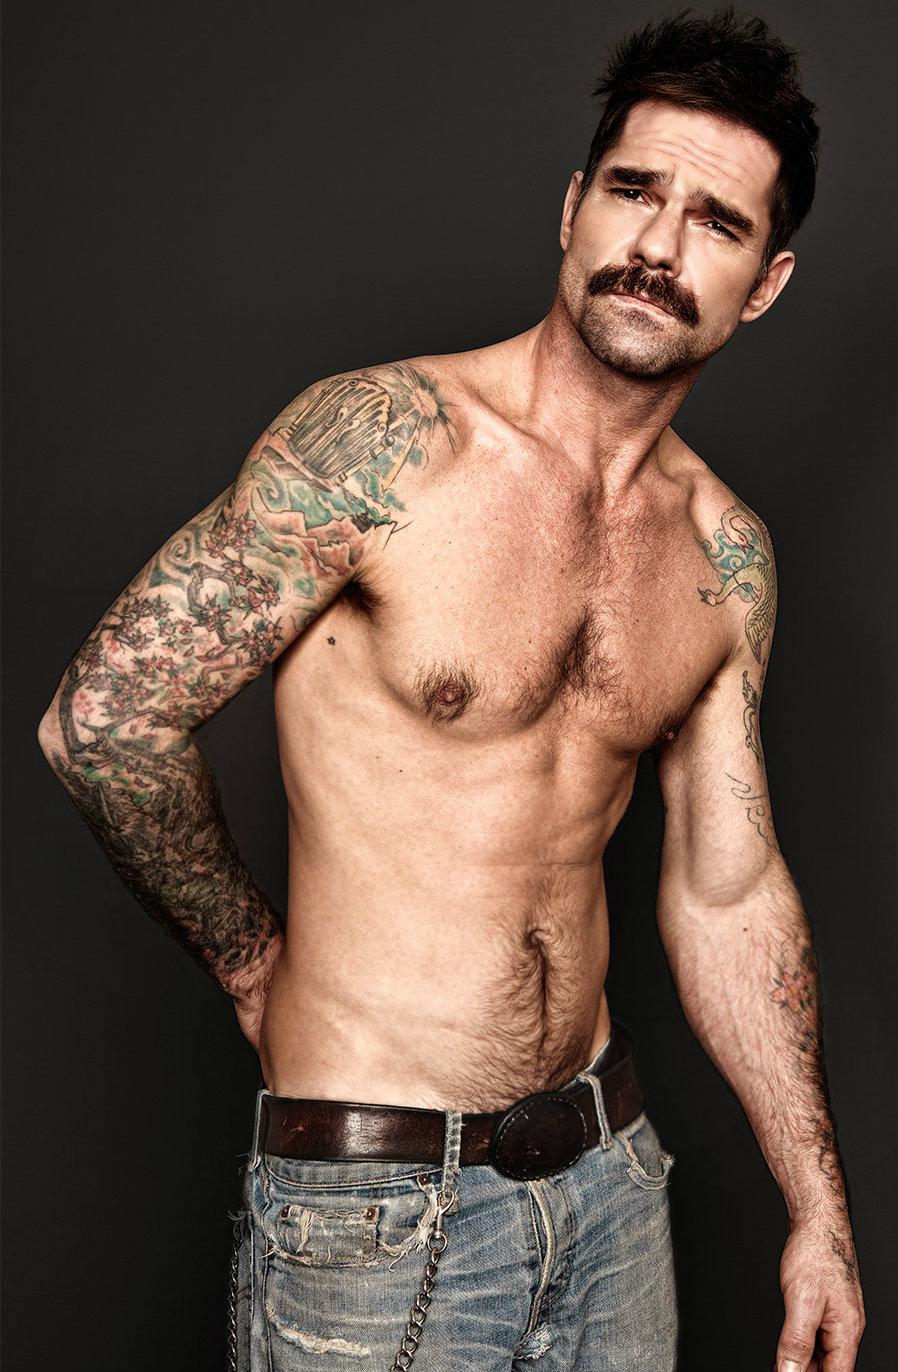 Badass and Sexy Mustaches Devilish Handsome Muscular Men